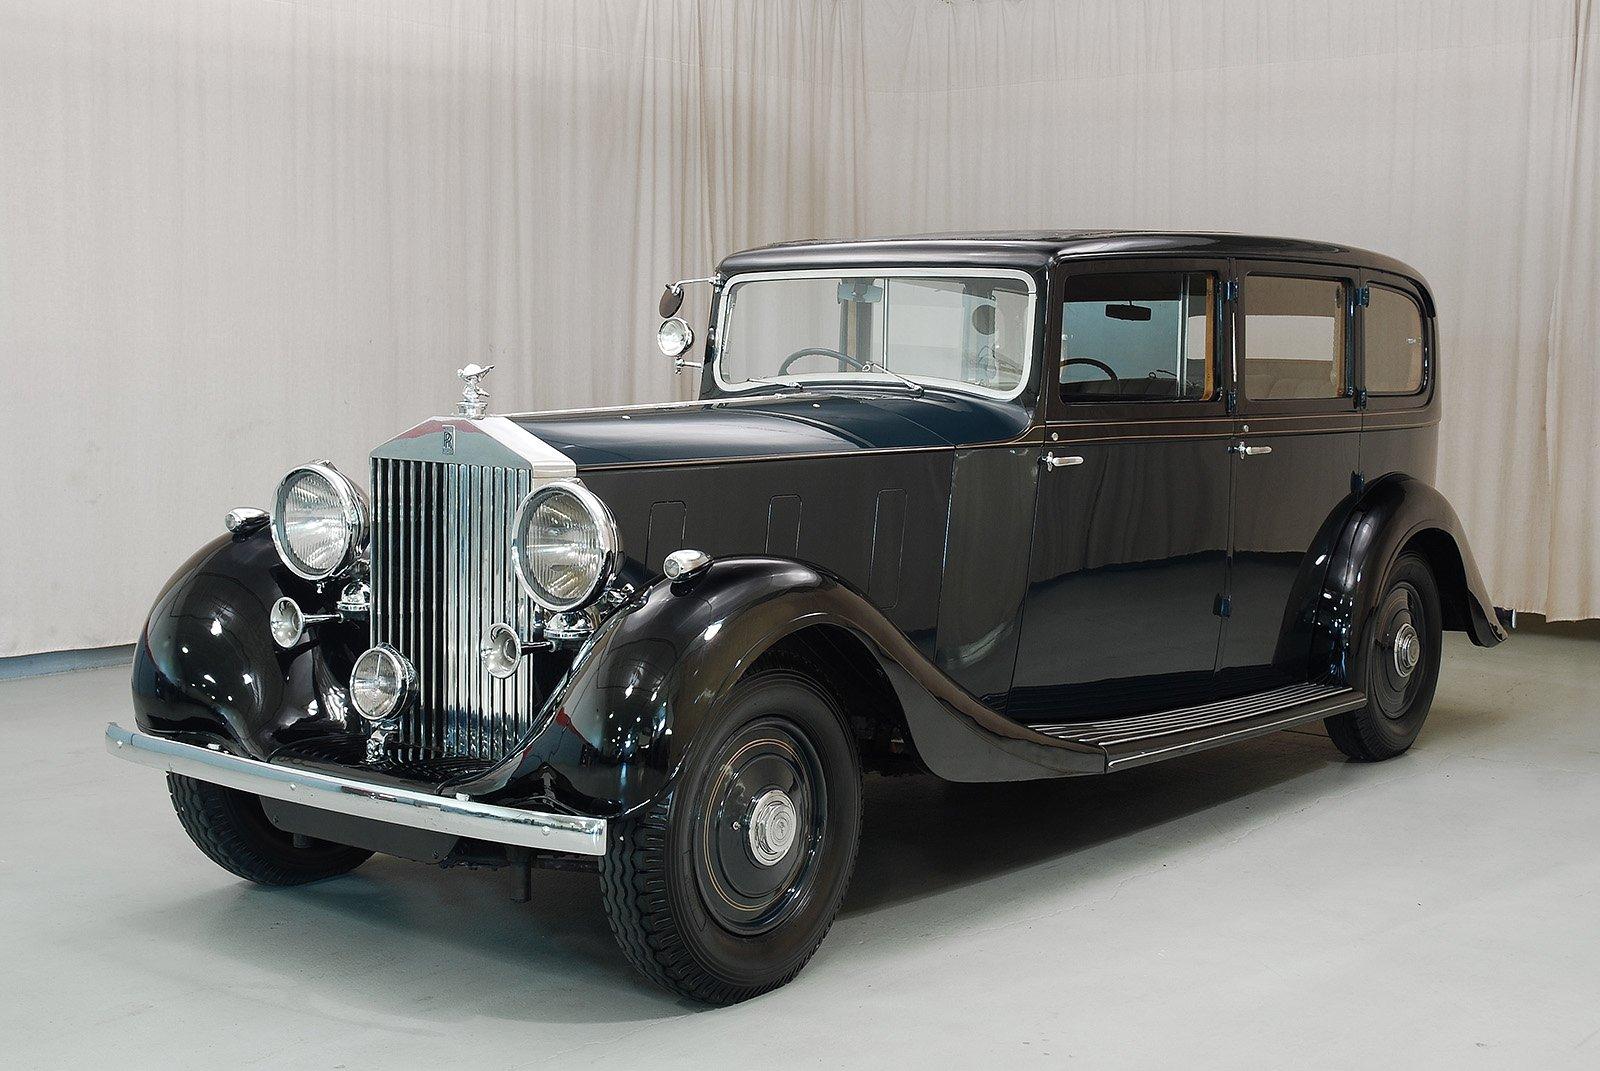 Limousine For Sale >> 1936 Rolls-Royce Phantom III Limousine | Hyman Ltd ...